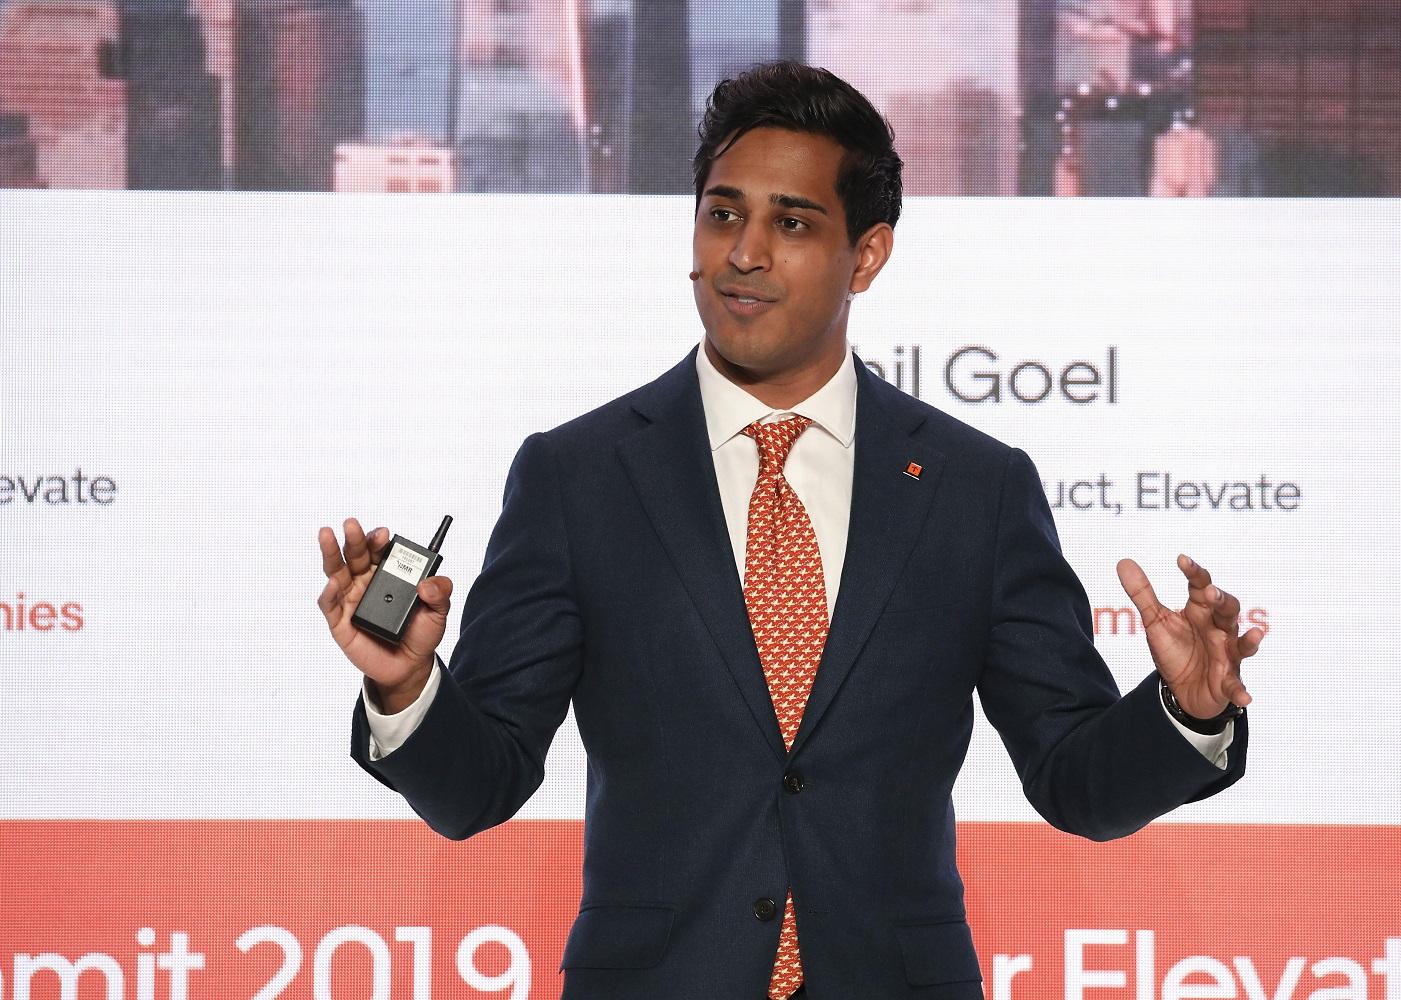 Nikhil Goel Uber Elevate 2019